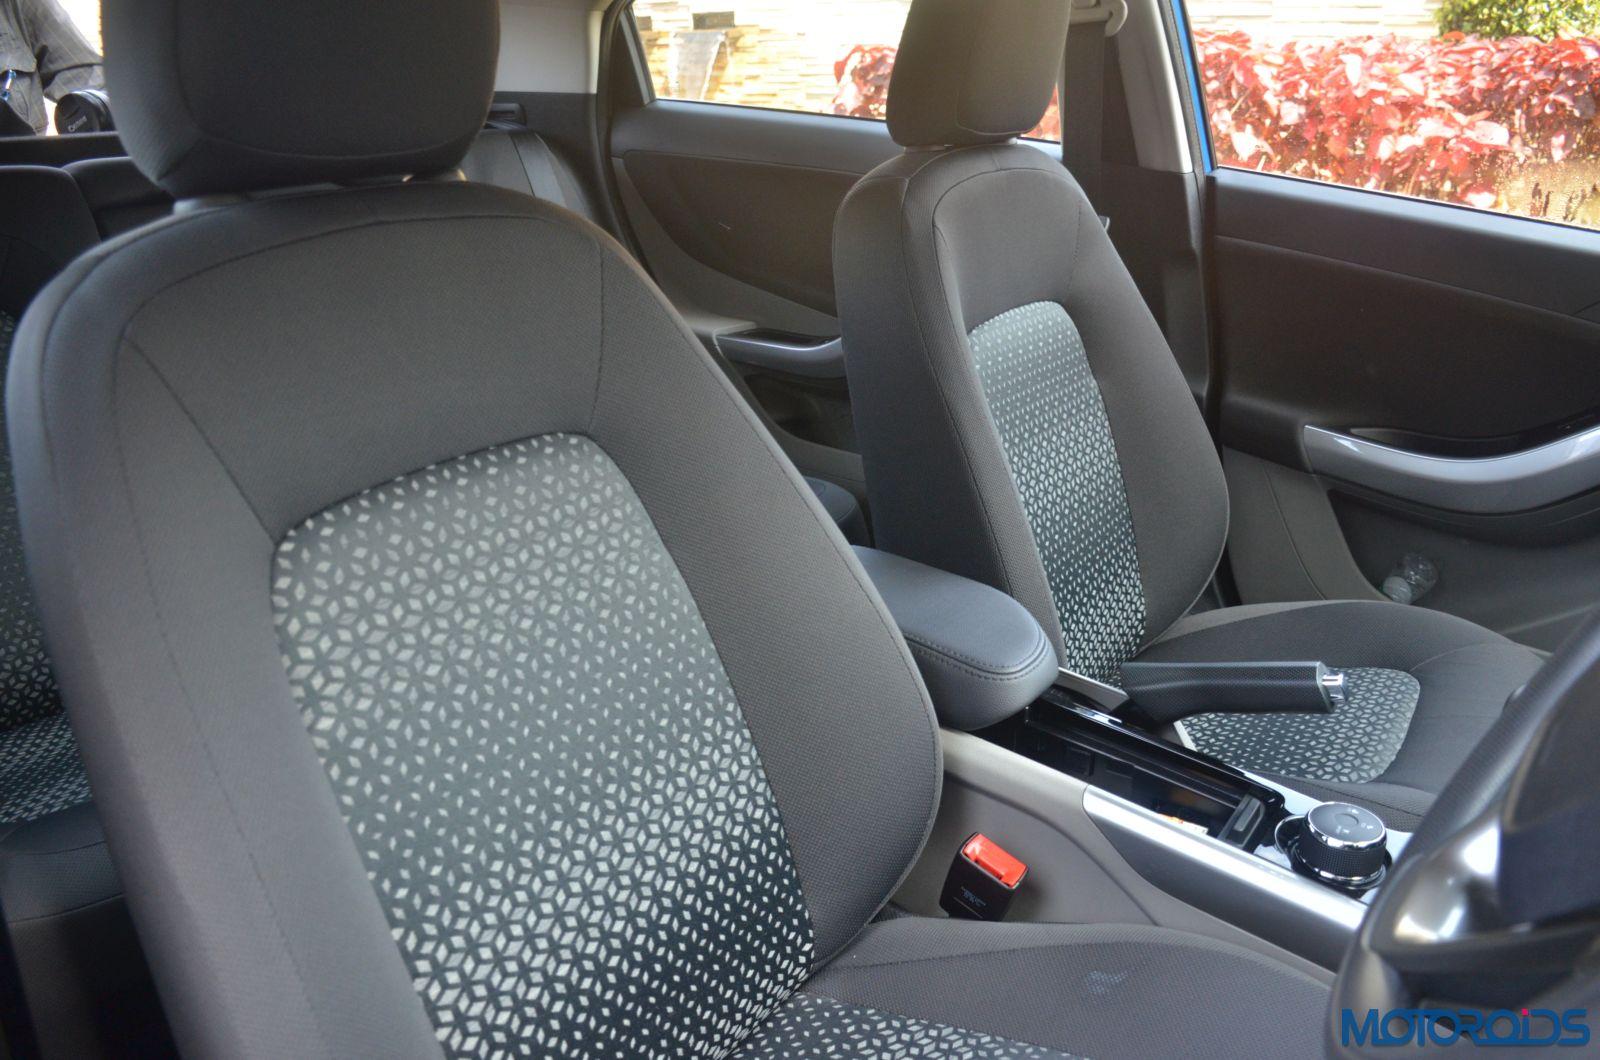 Tata-Nexon-front-seats